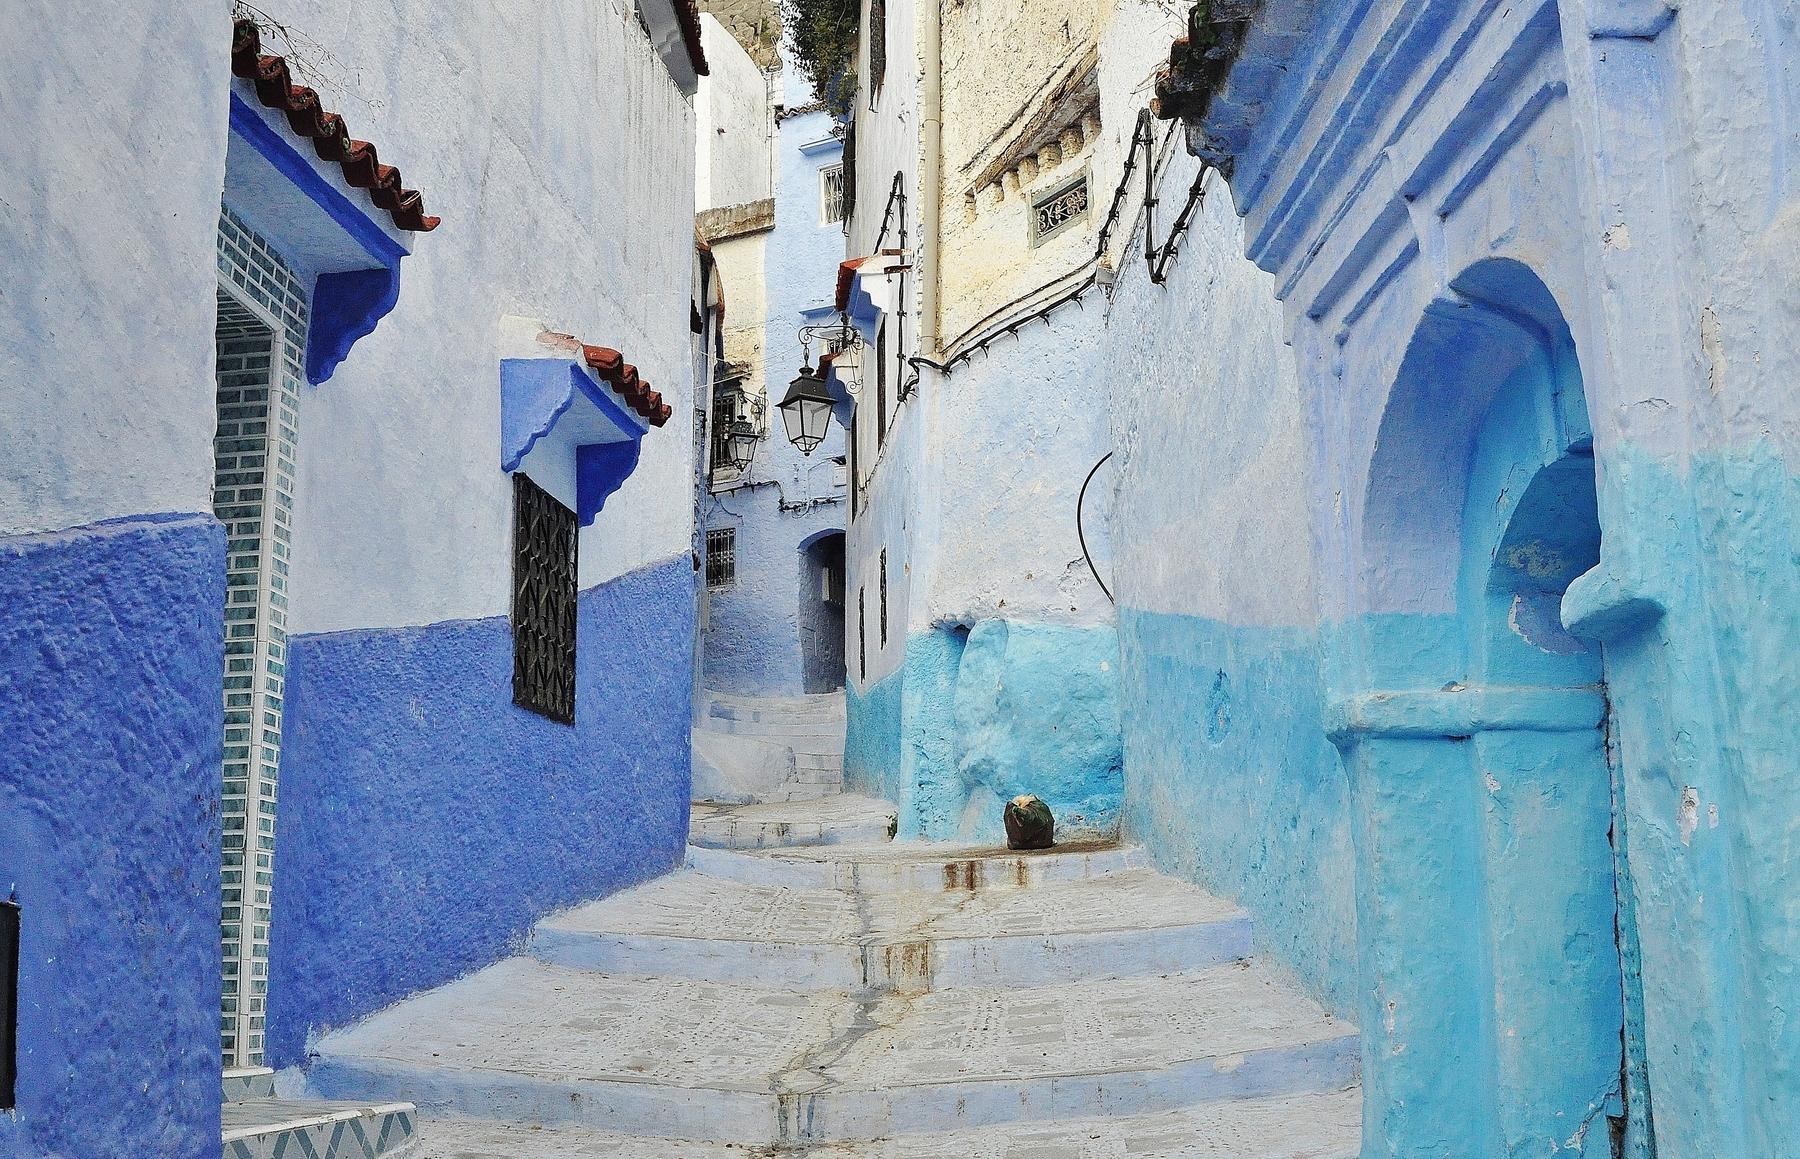 Синий город Шефшауэн (Шавен) в Марокко